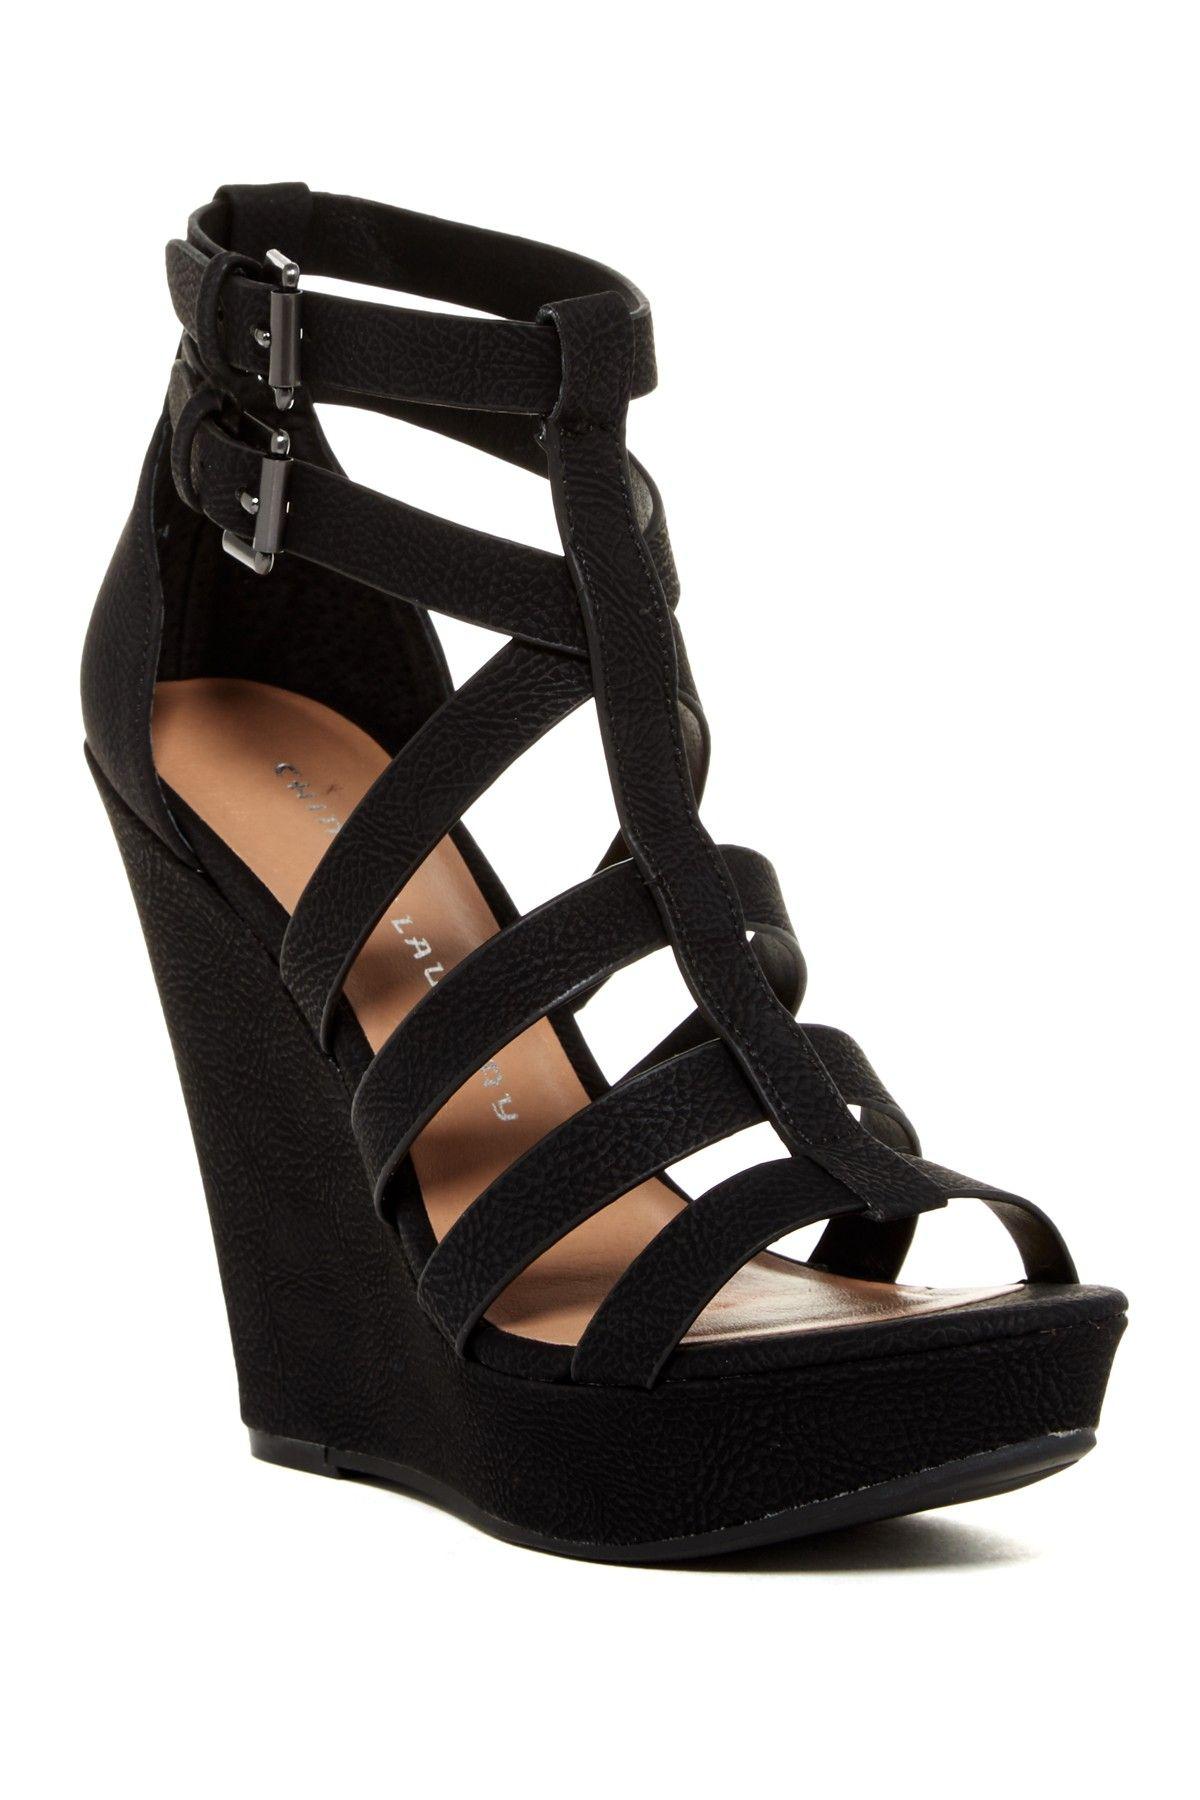 Chinese Laundry Mali Strappy Platform Wedge Sandal Platform Wedge Sandals Strappy Sandals Heels Black Wedge Shoes